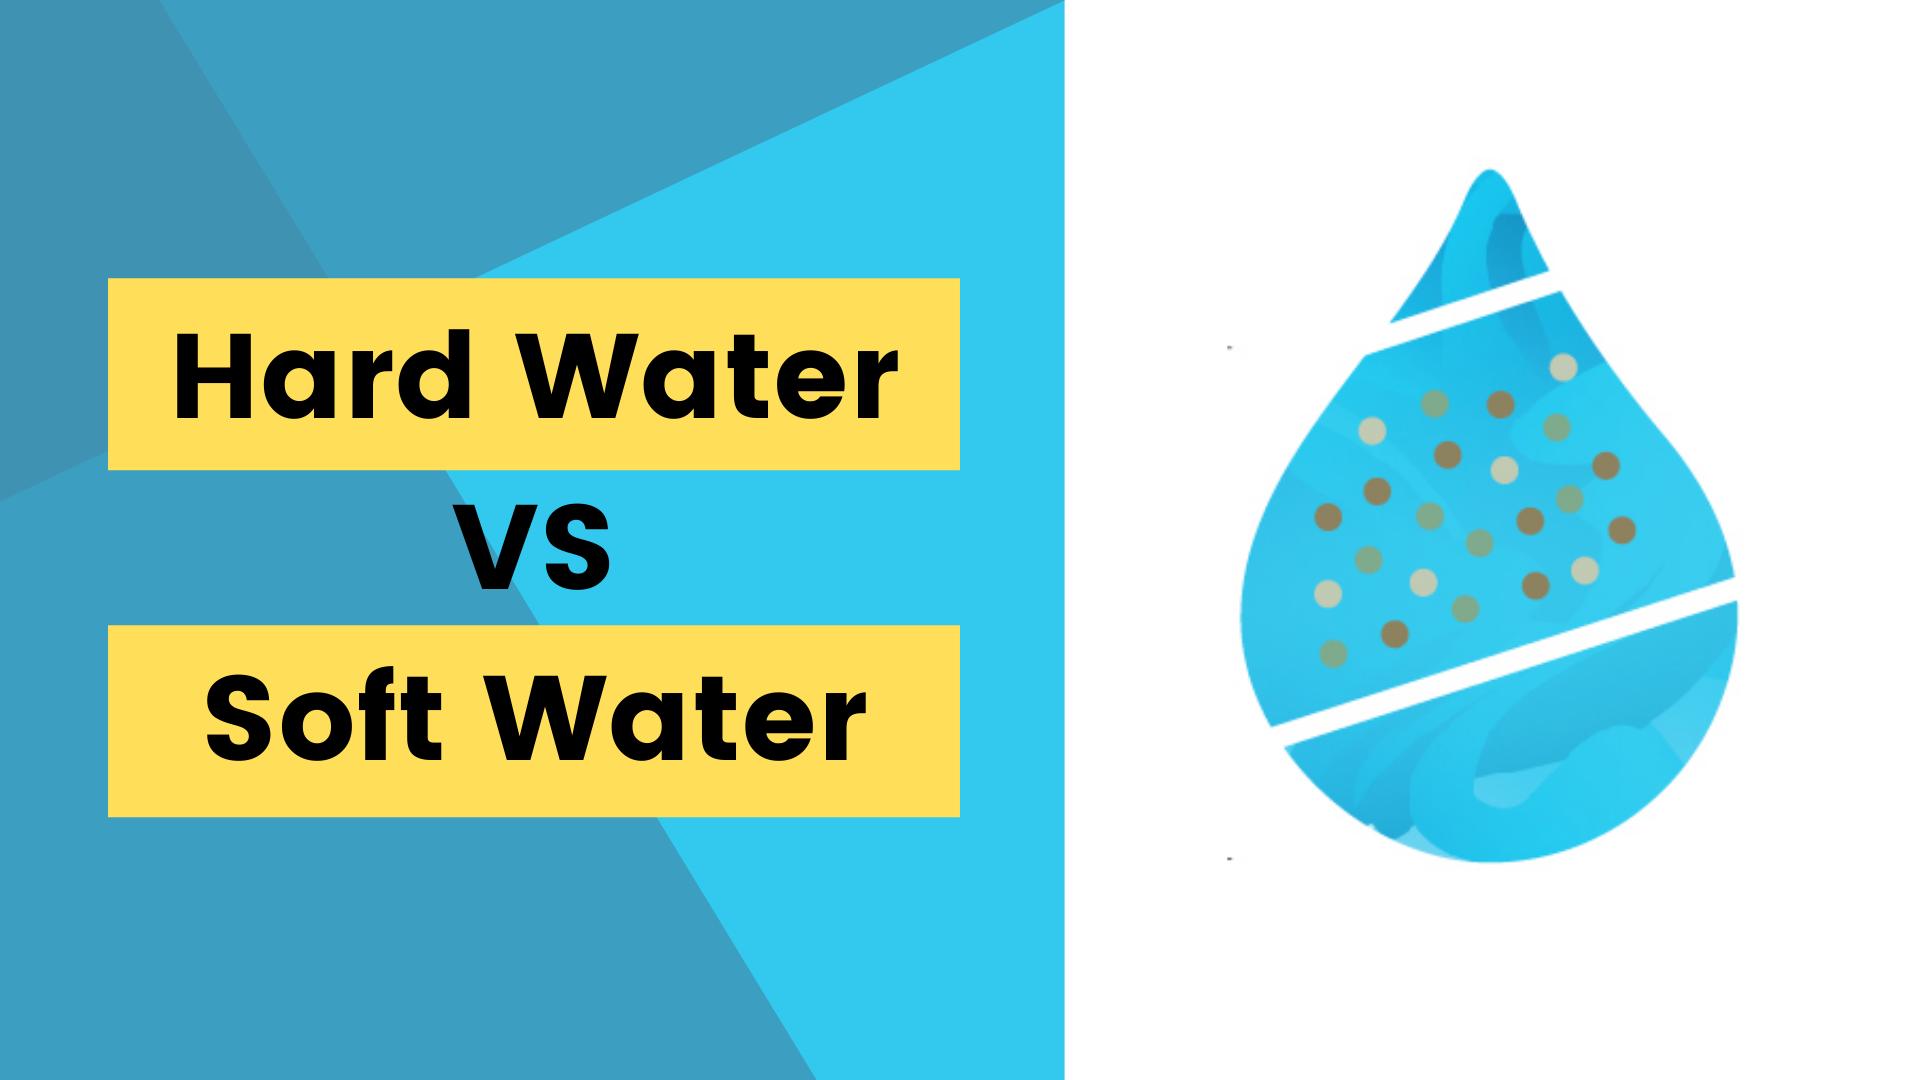 Hard Water VS Soft Water